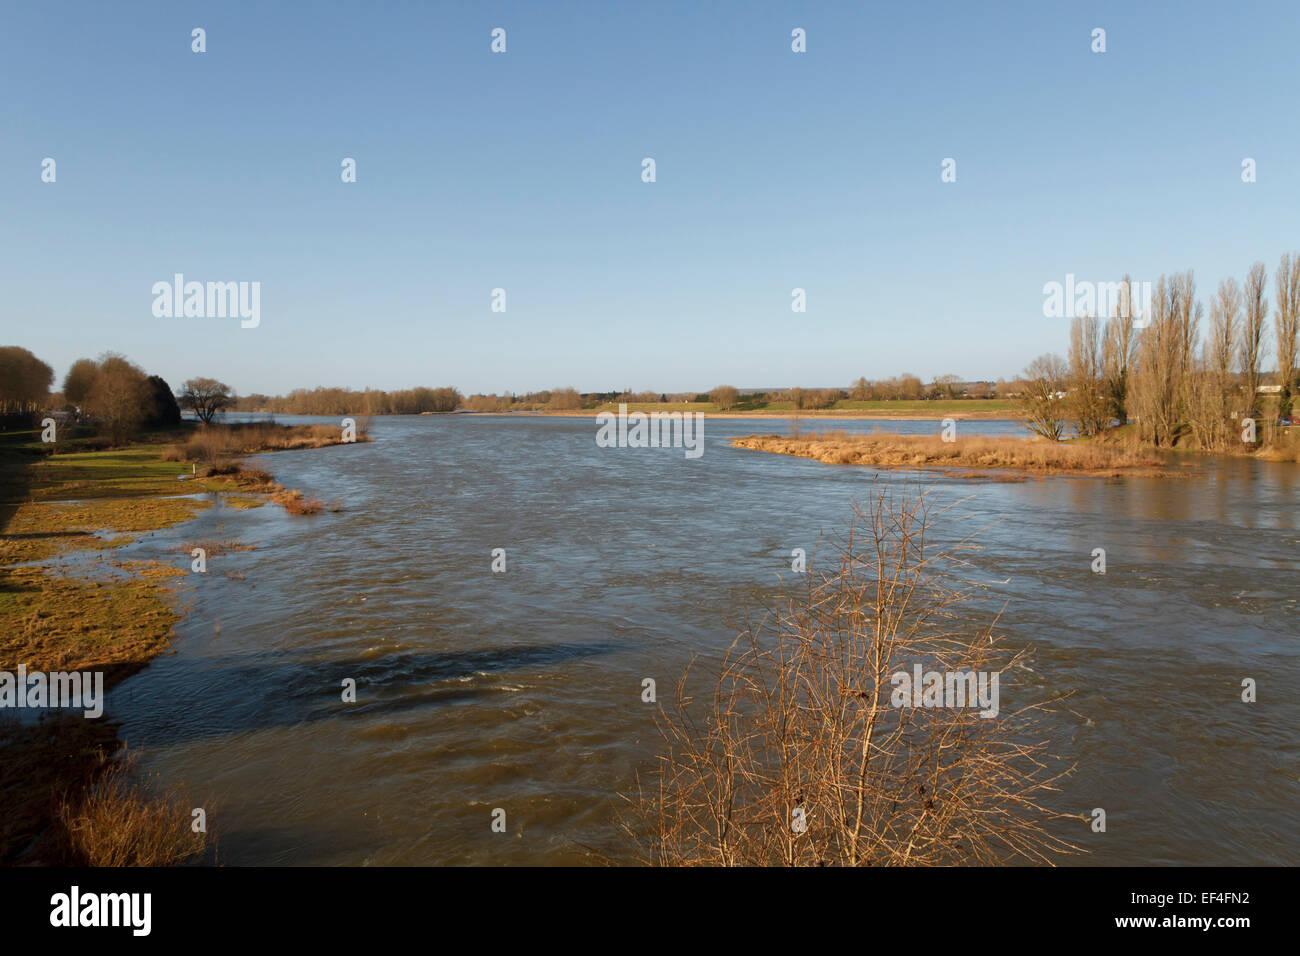 Campo con agua, río Loira, cerca de Amboise, Indre et Loire, Francia. Imagen De Stock